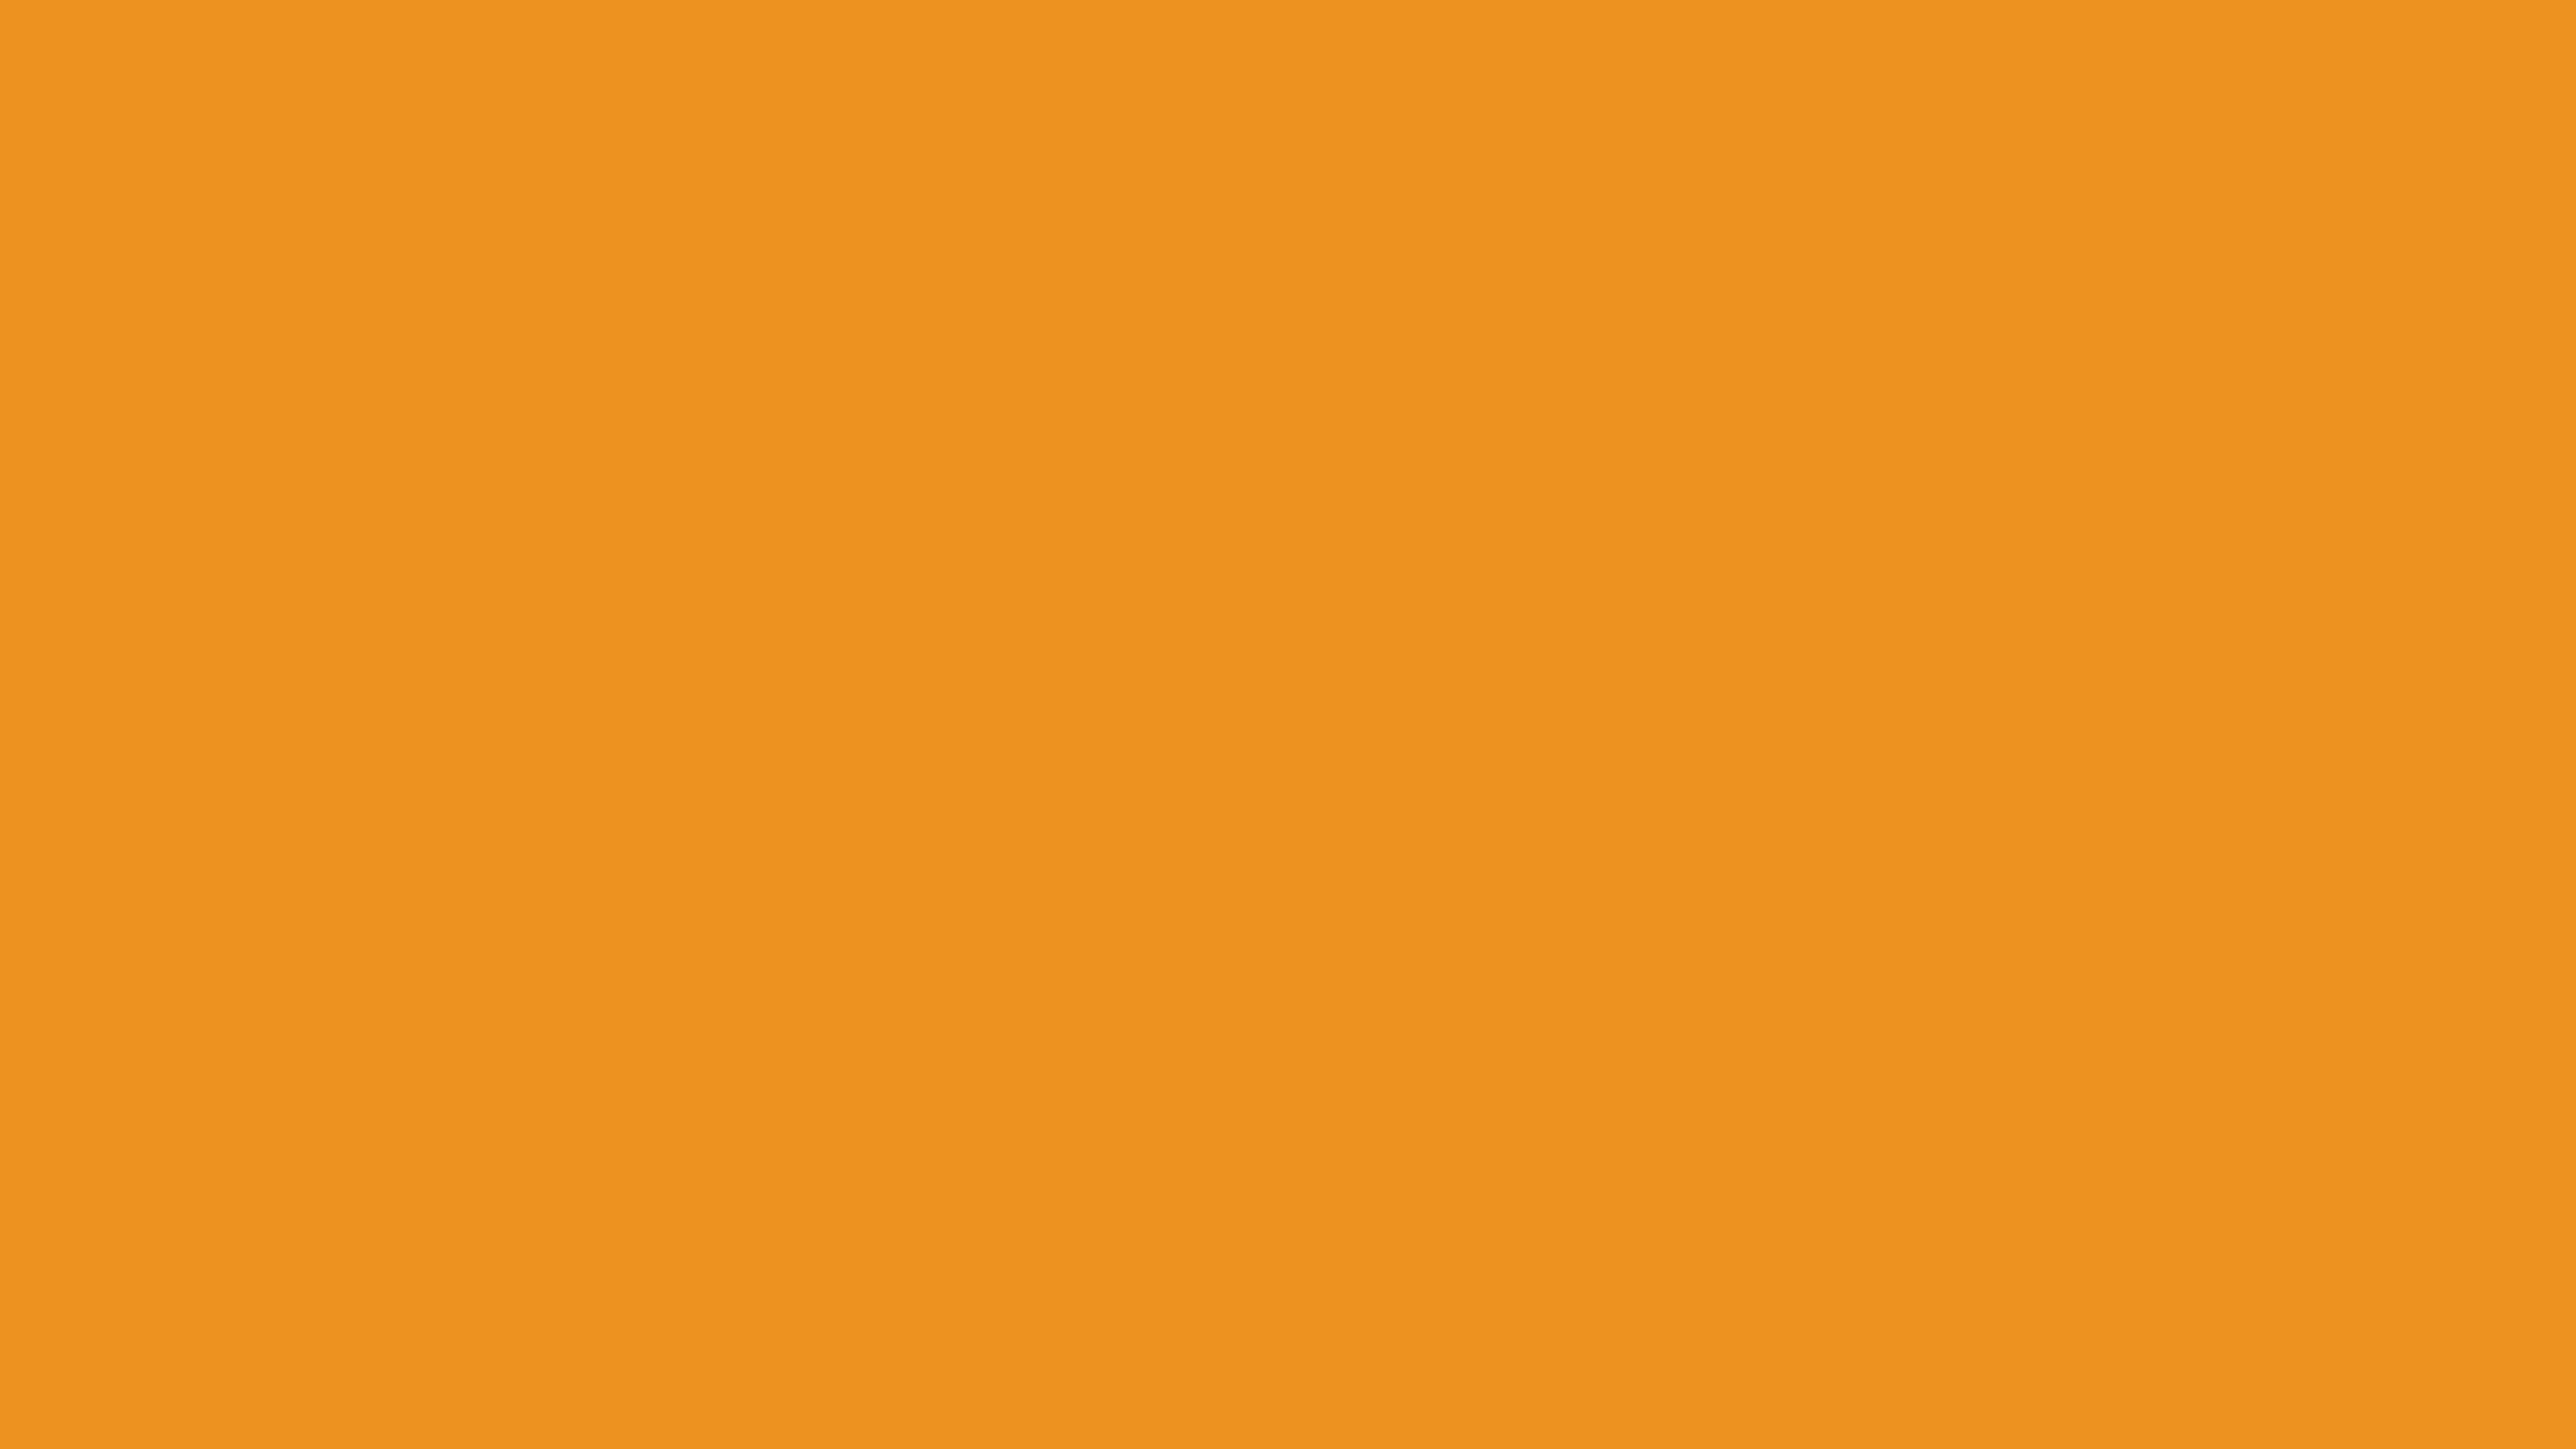 5120x2880 Carrot Orange Solid Color Background